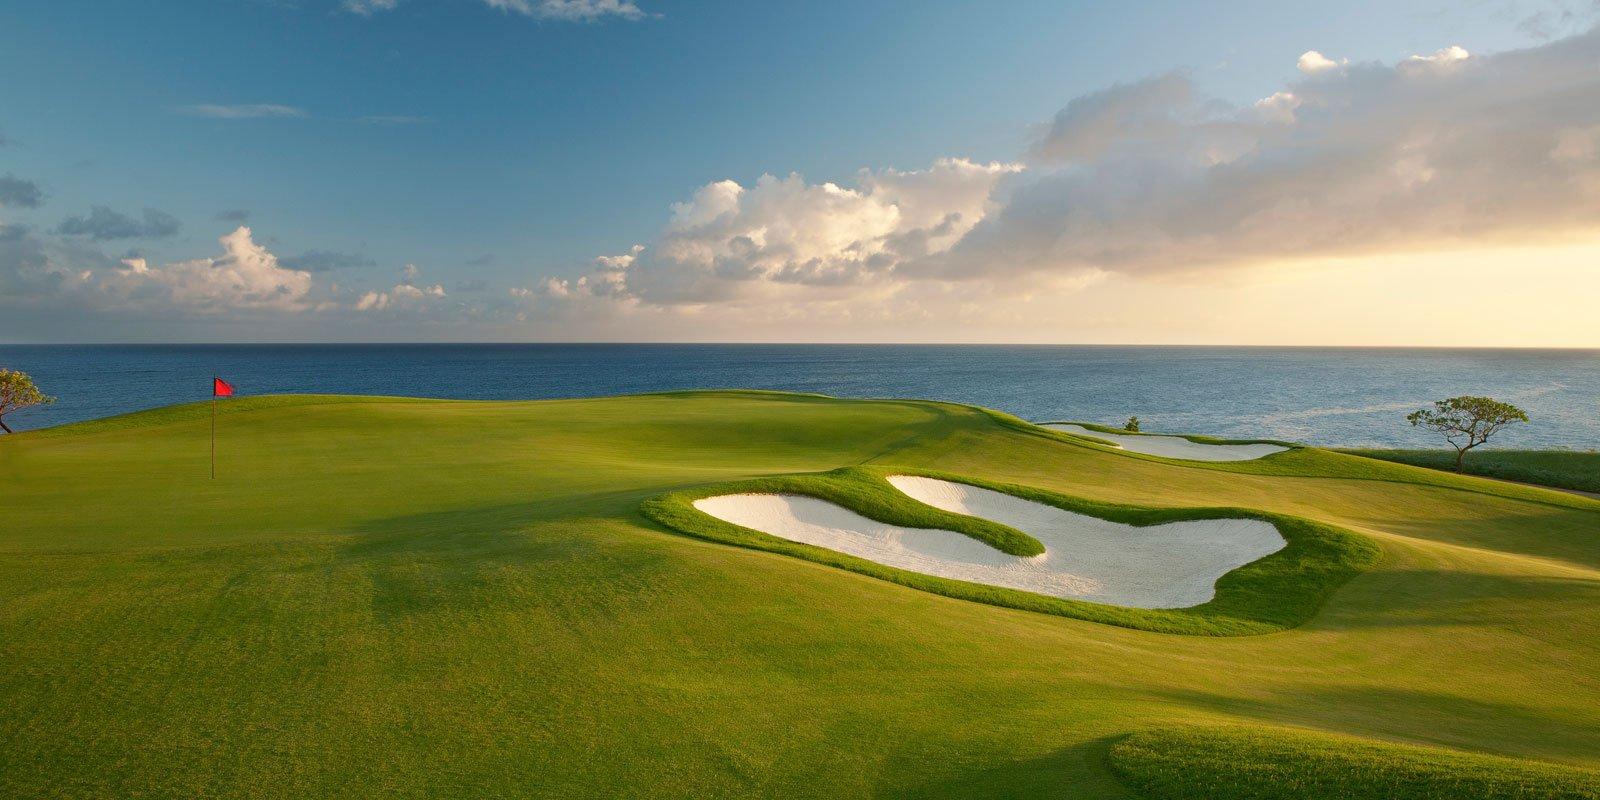 14th hole at kukuiula golf course